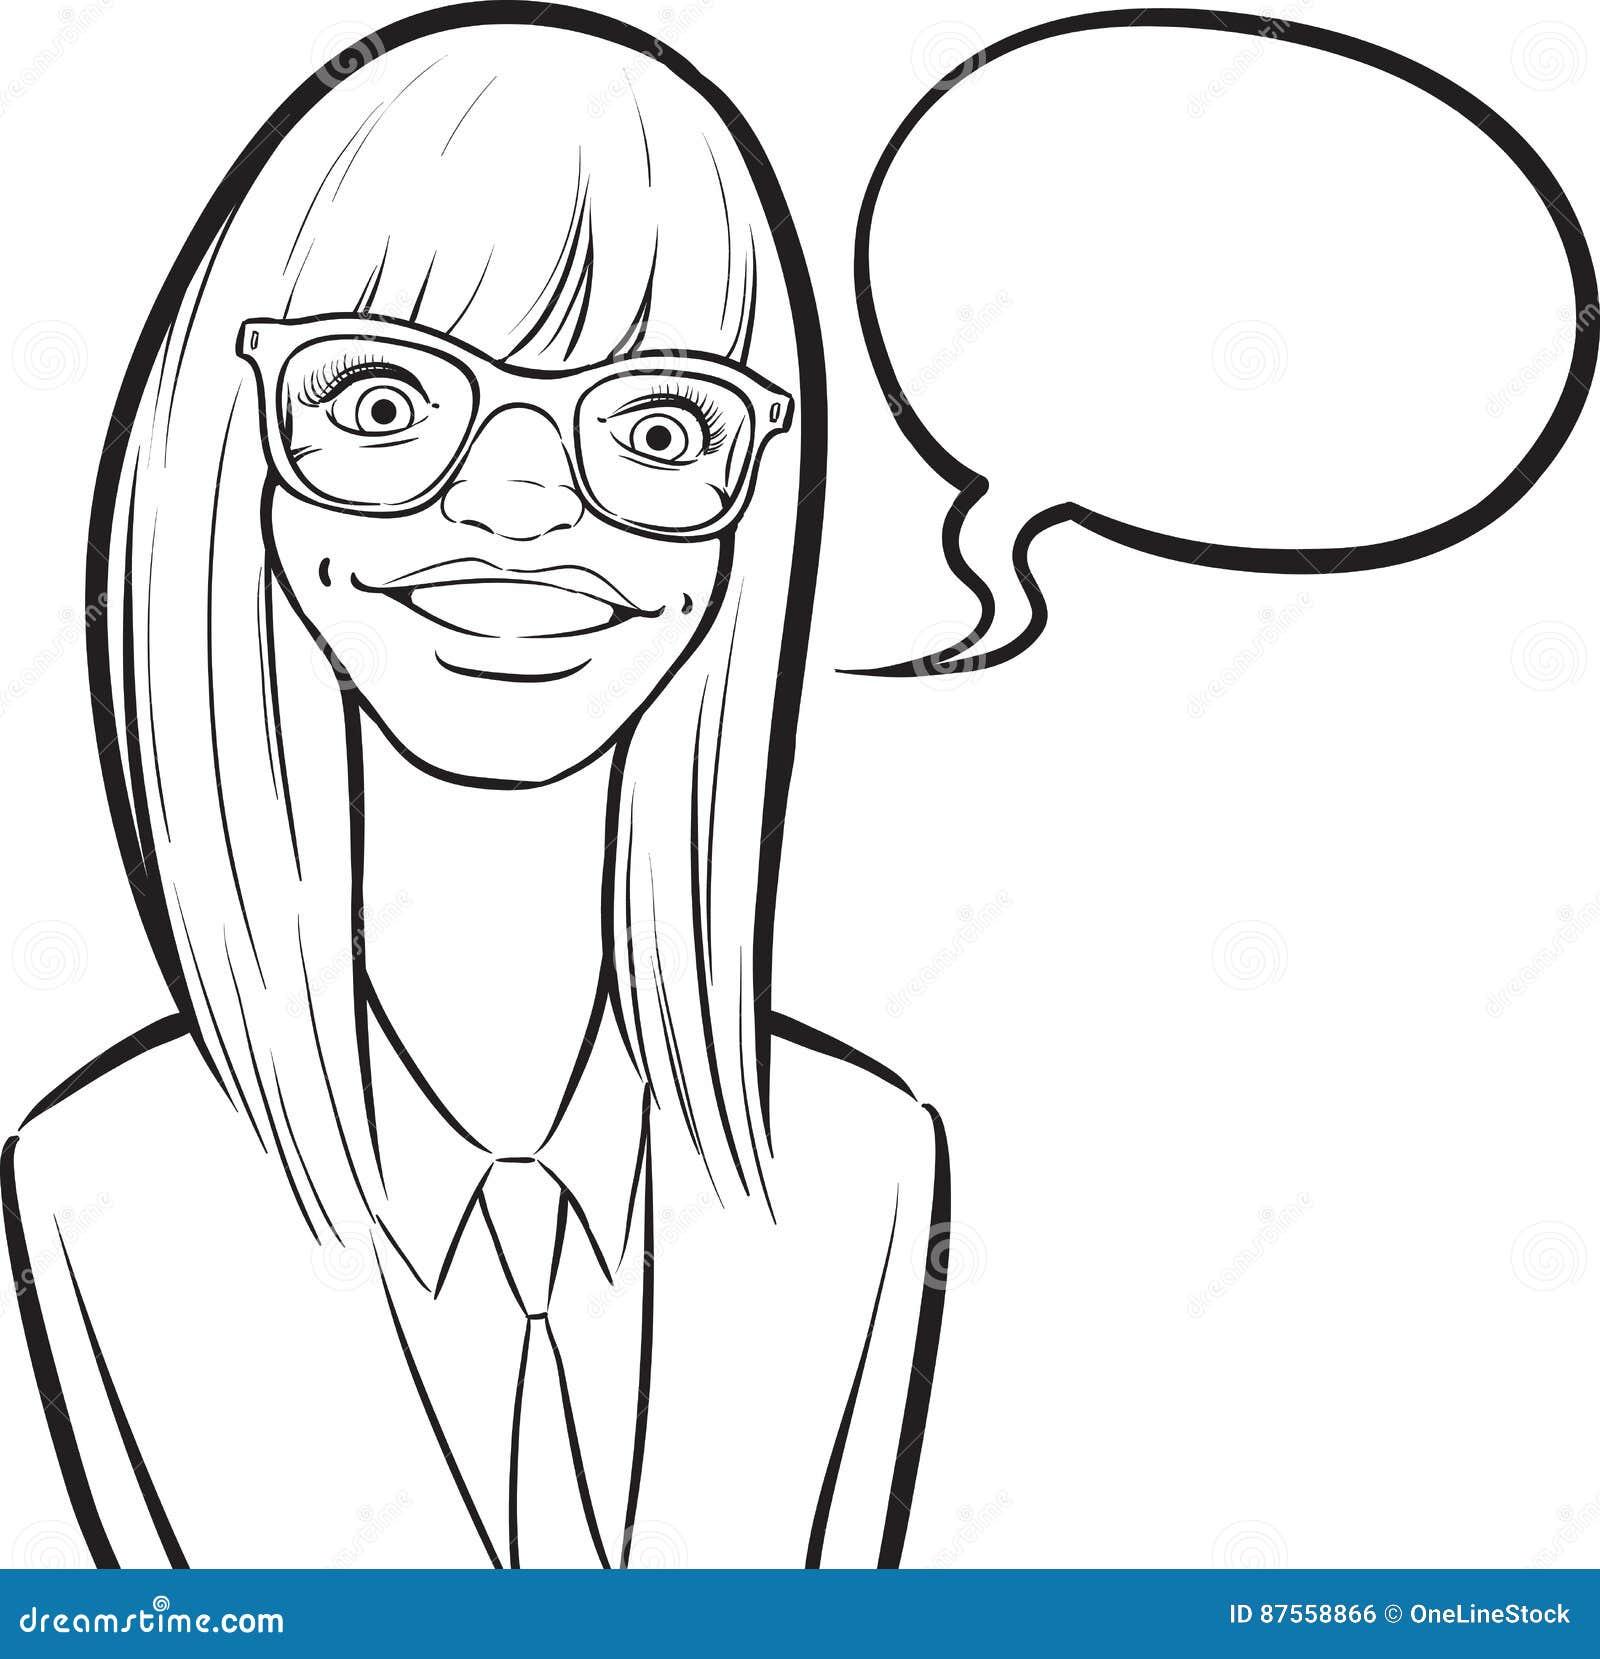 Whiteboard drawing cartoon smiling nerd girl in glasses